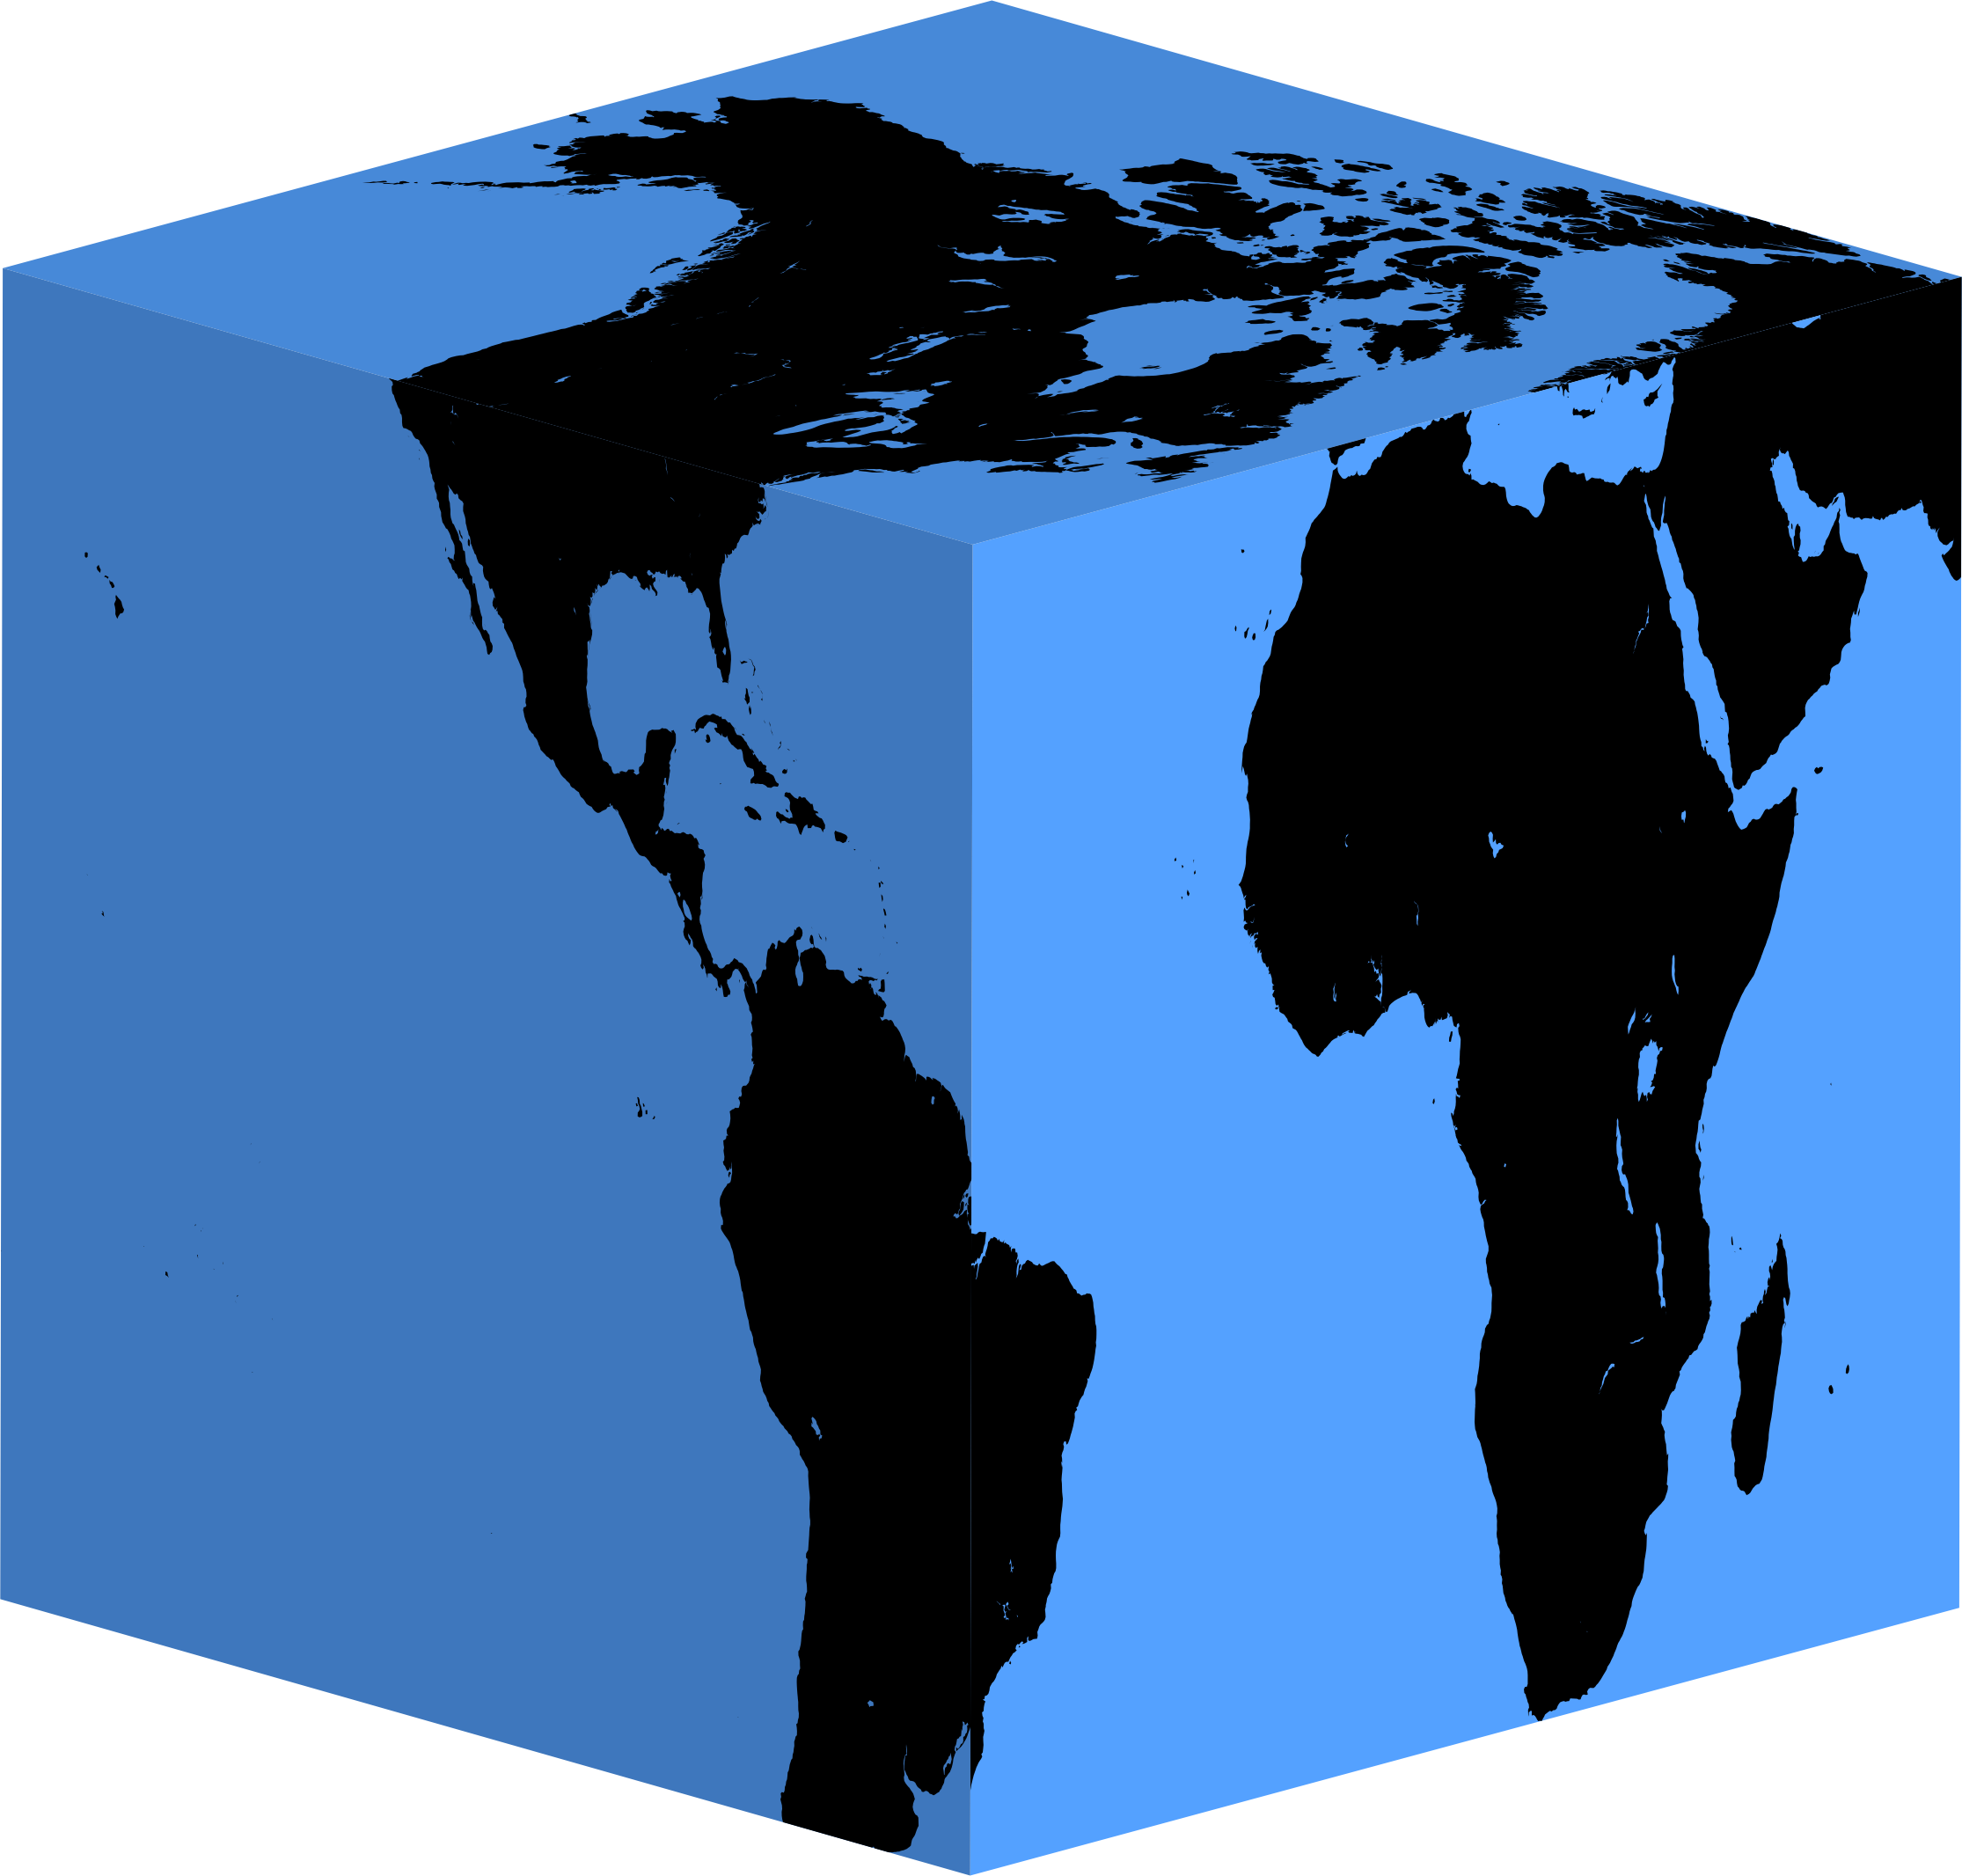 Clipart Cube Earth Silhouette.